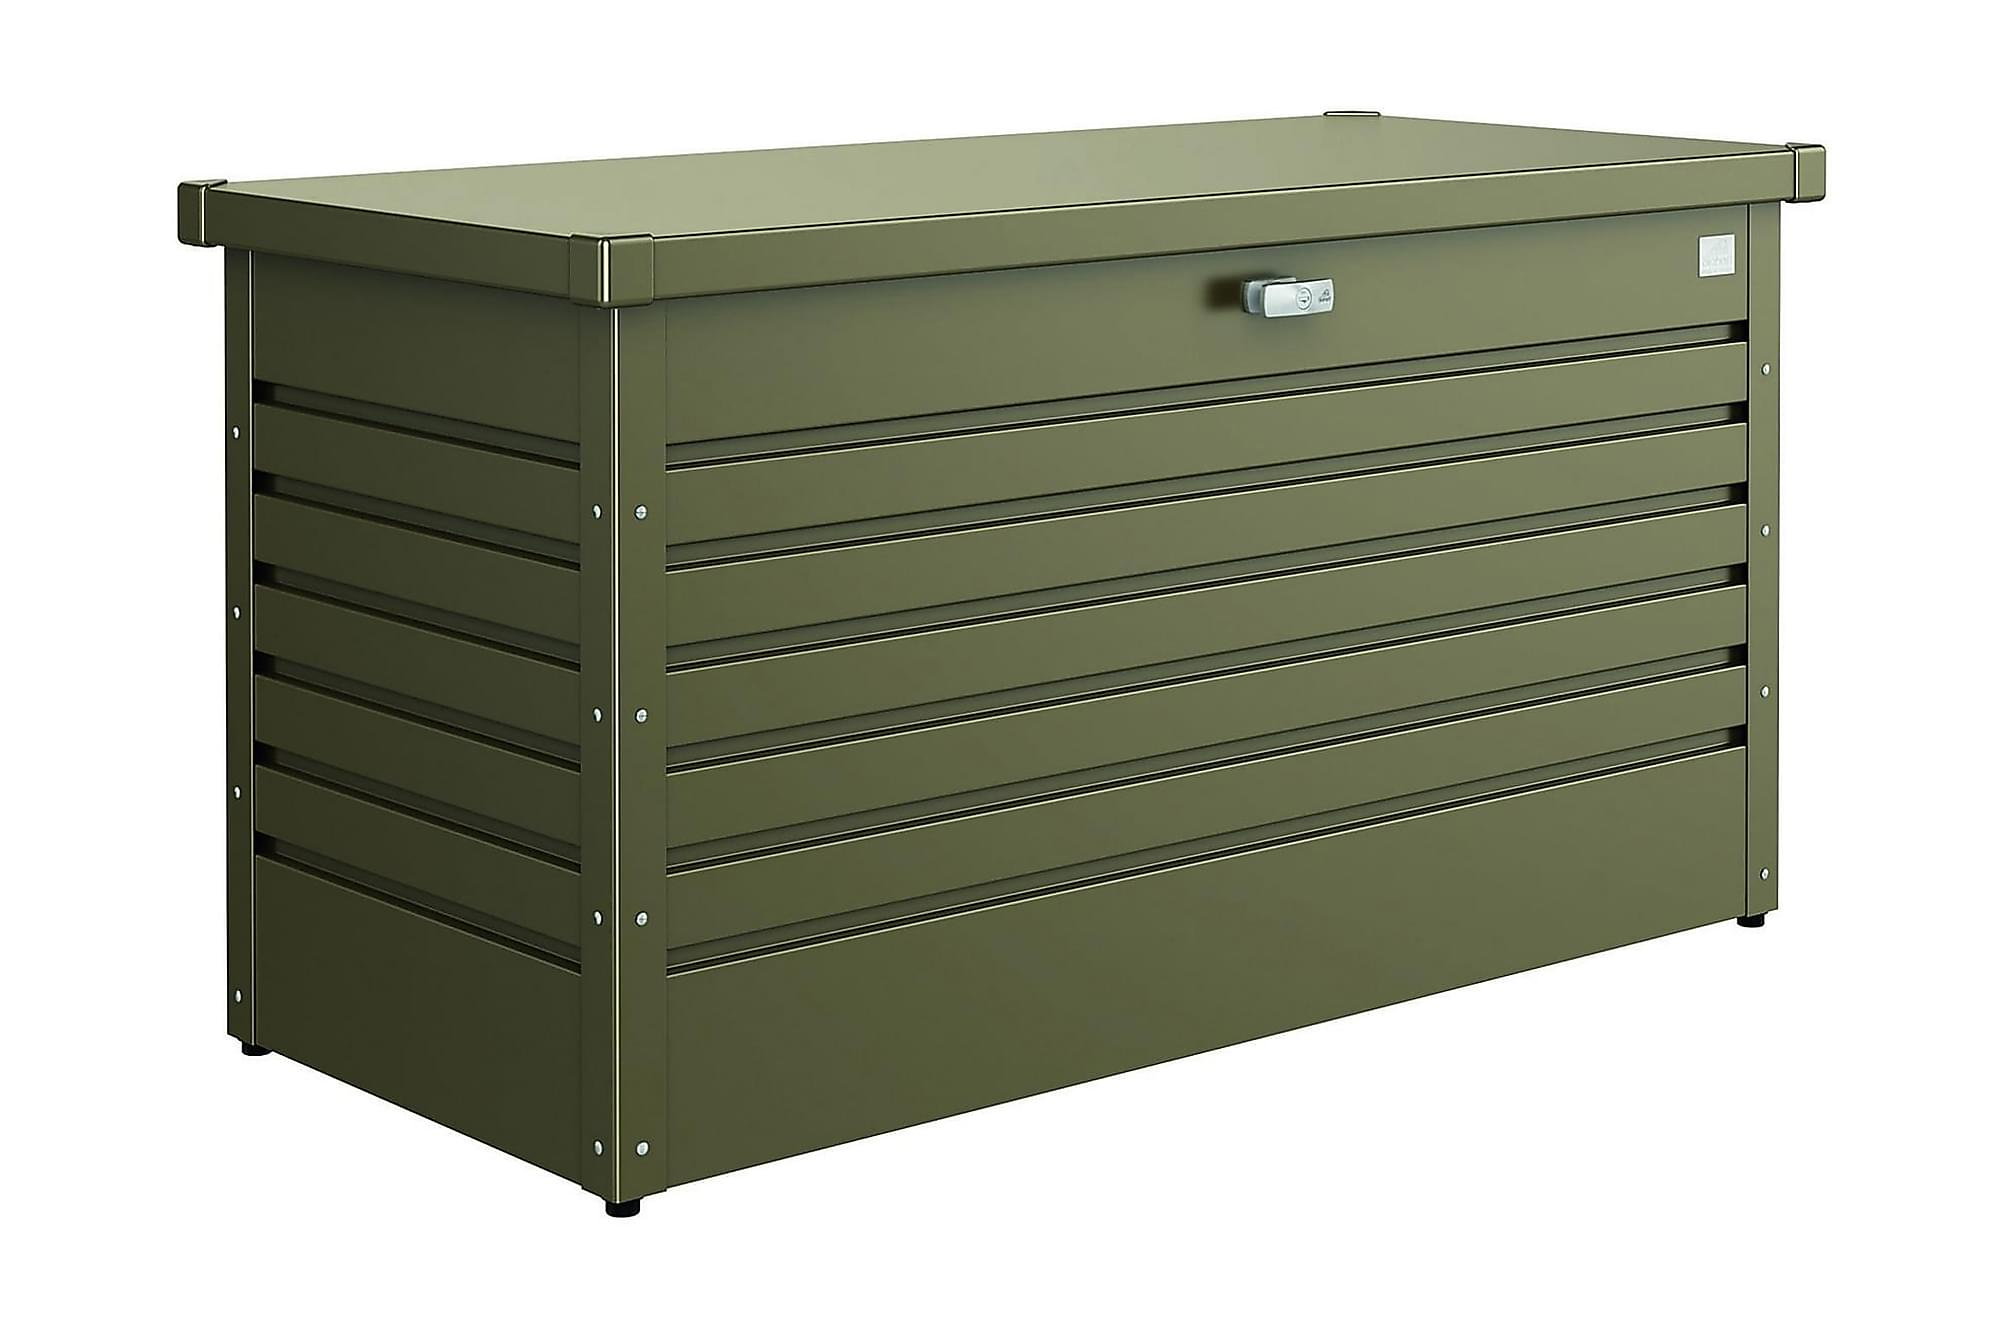 Dynbox 130 Brons, Dynboxar & dynlådor